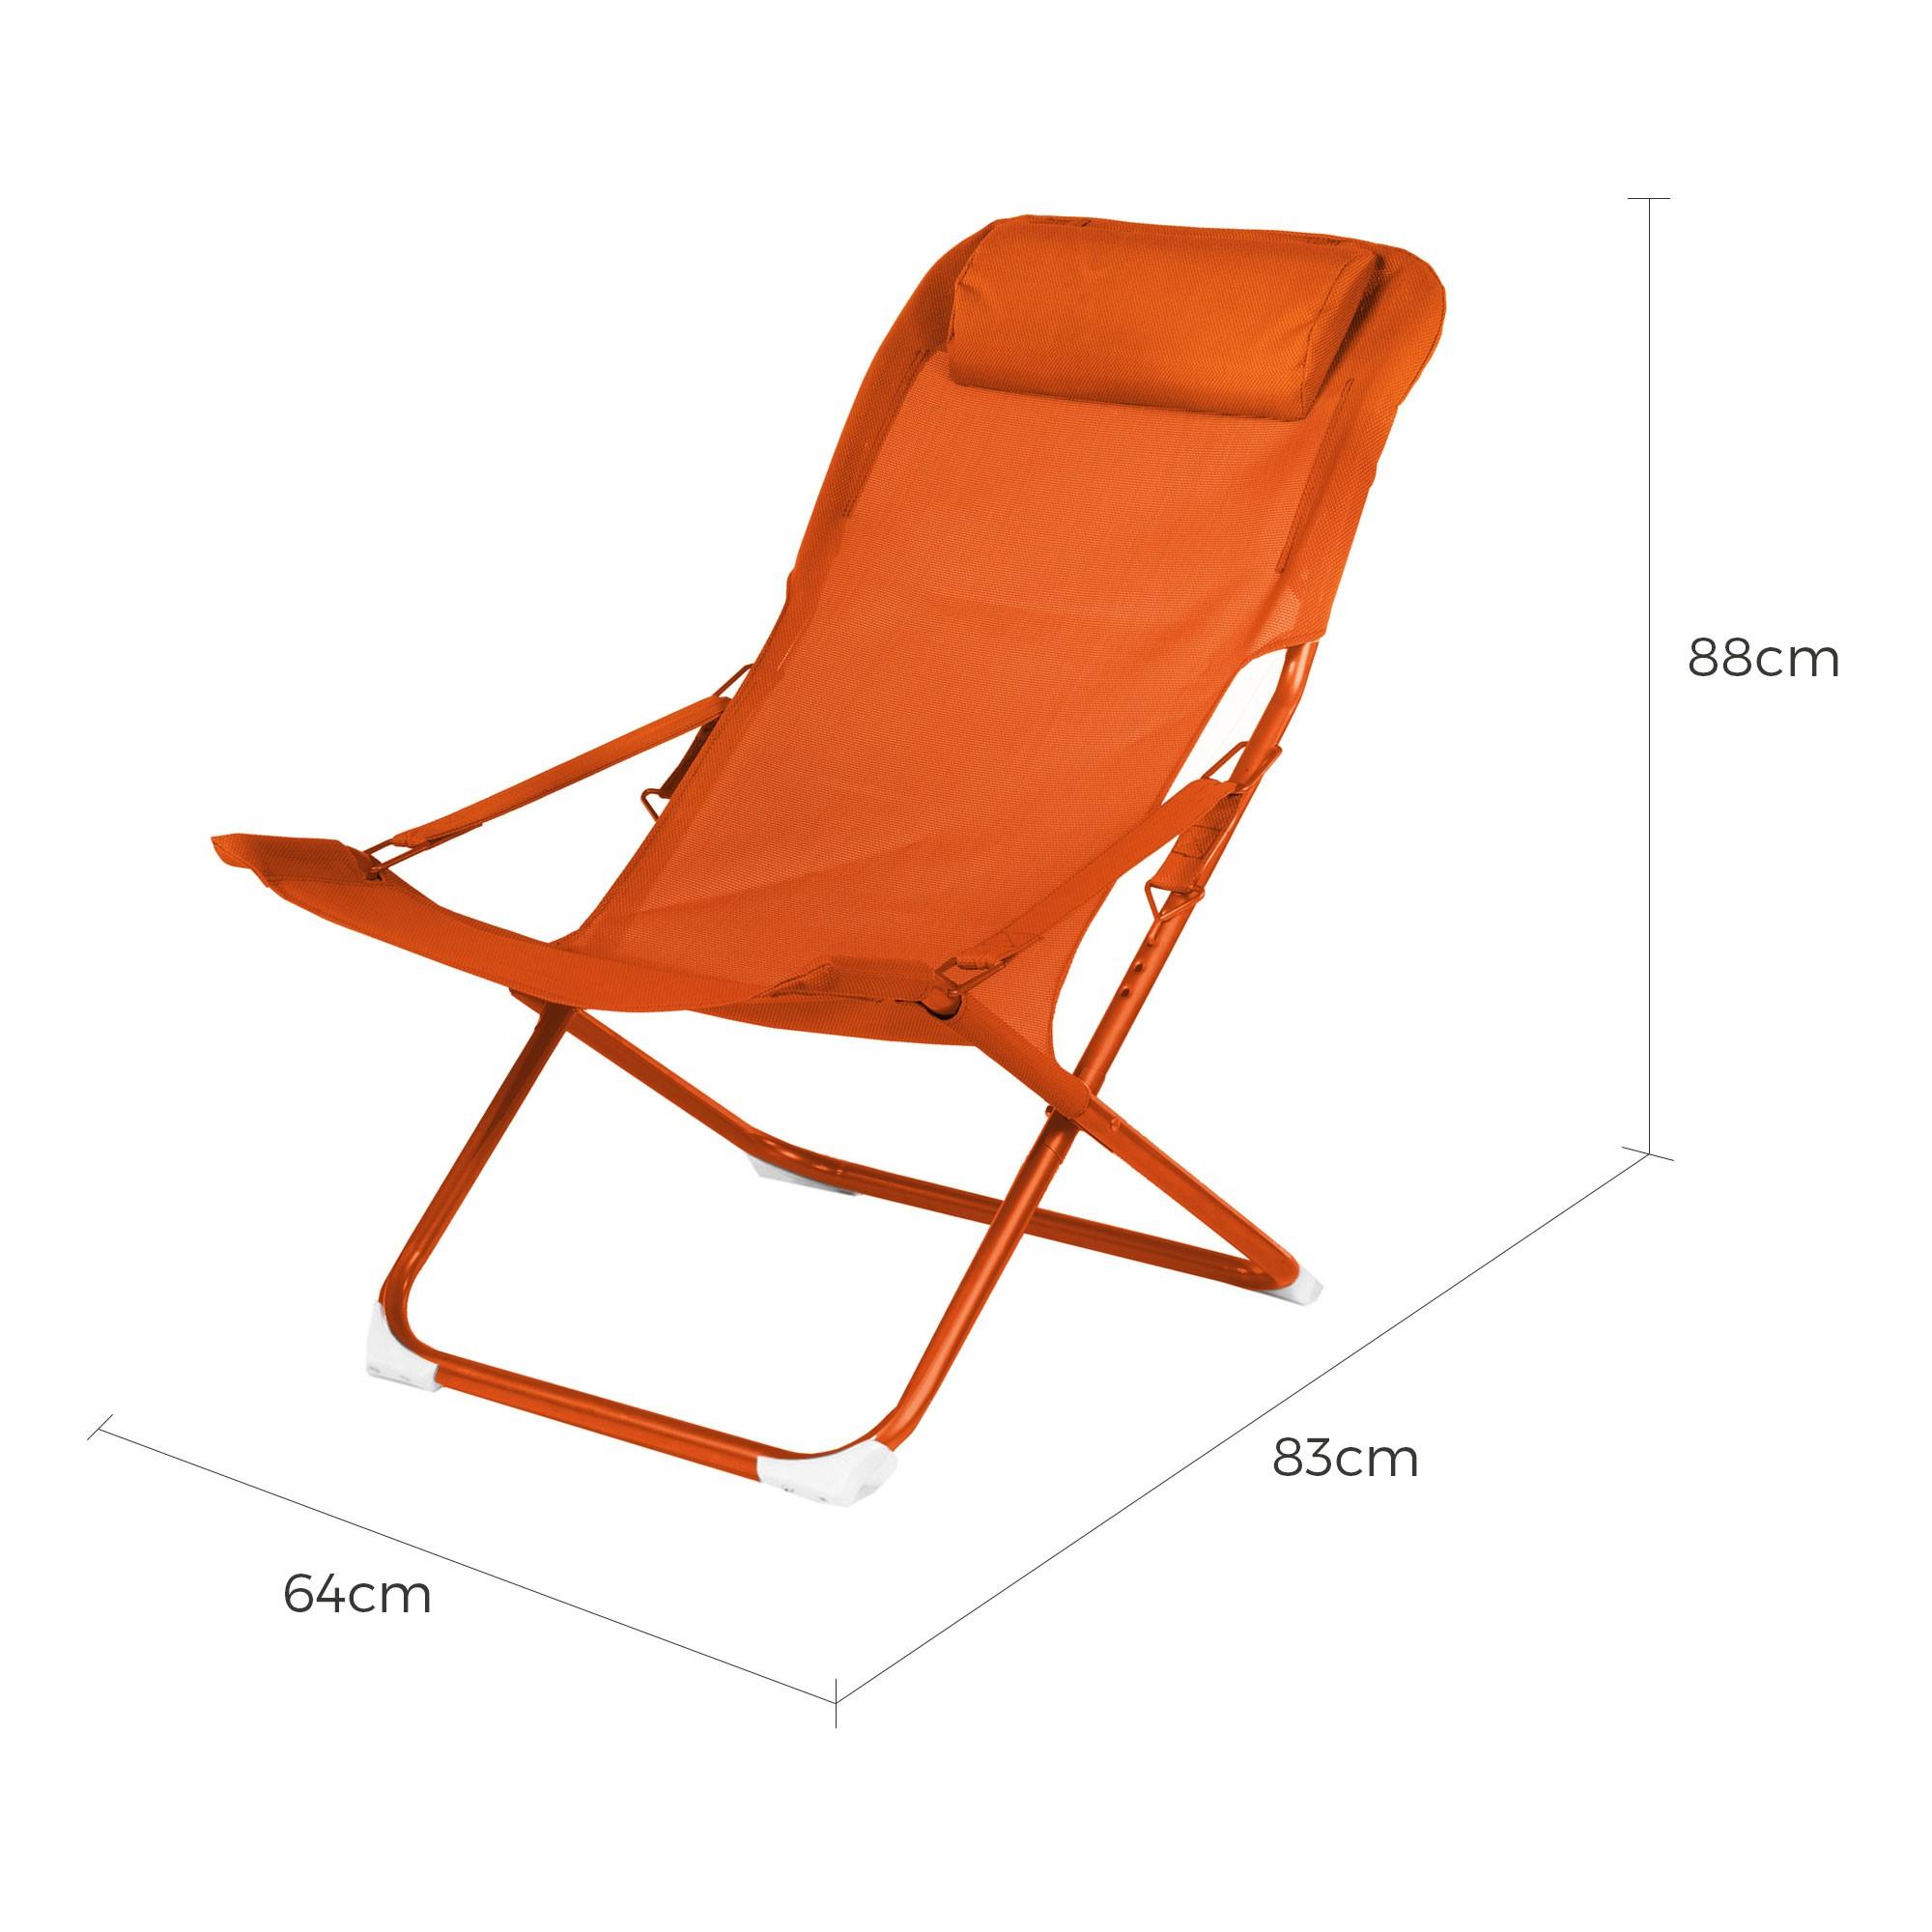 Chaise Longue Confortable Chaise Longue Rinconera Comfy